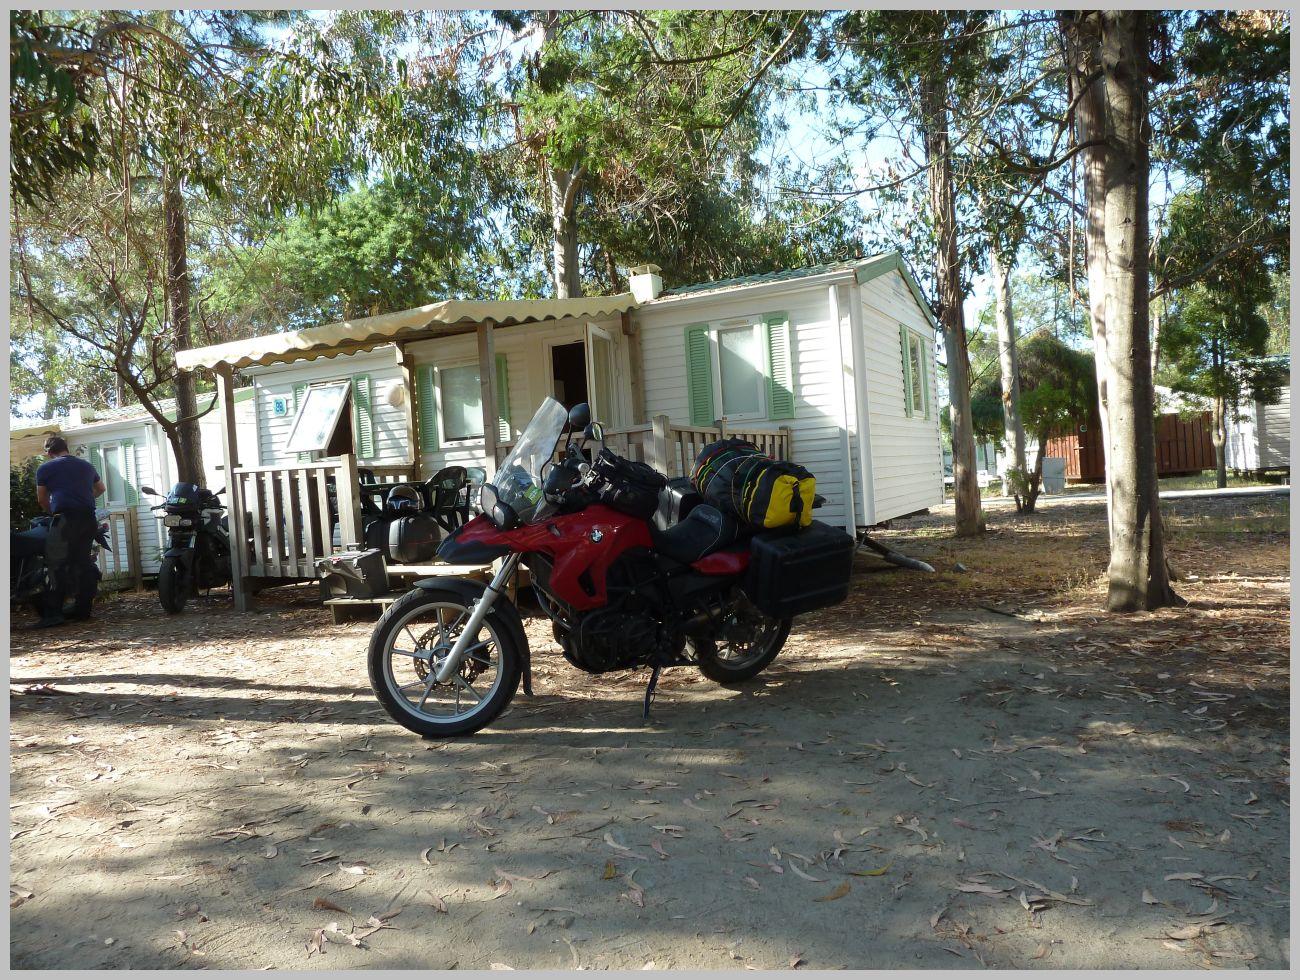 201206_Korsika_Moped106